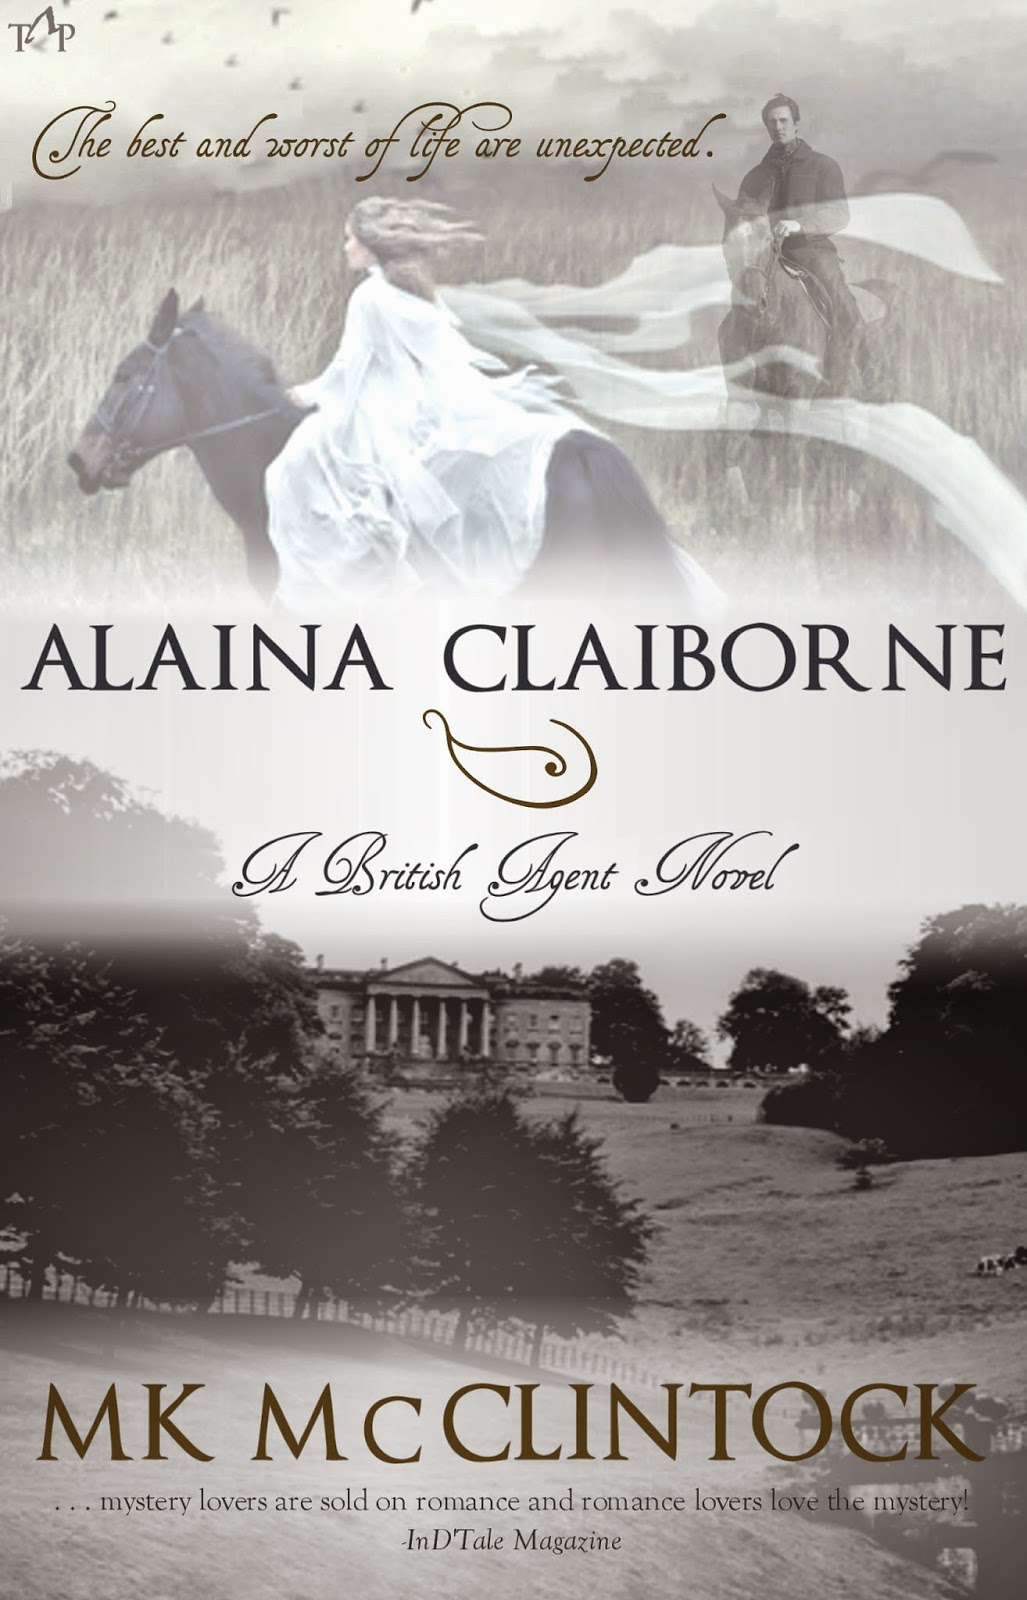 AlainaClaiborne.jpg